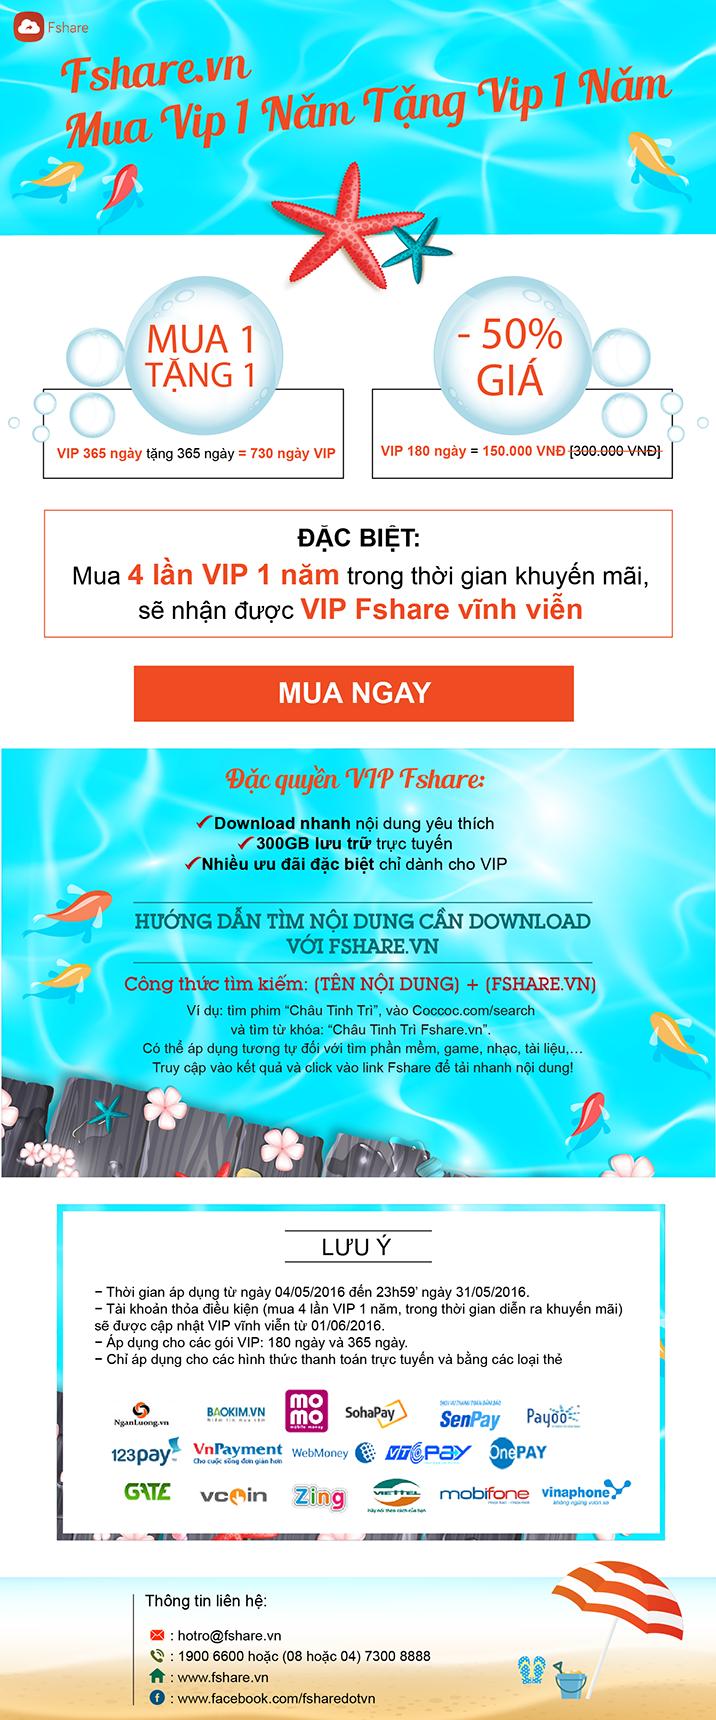 VIP FSHARE MUA 1 NĂM TẶNG 1 NĂM